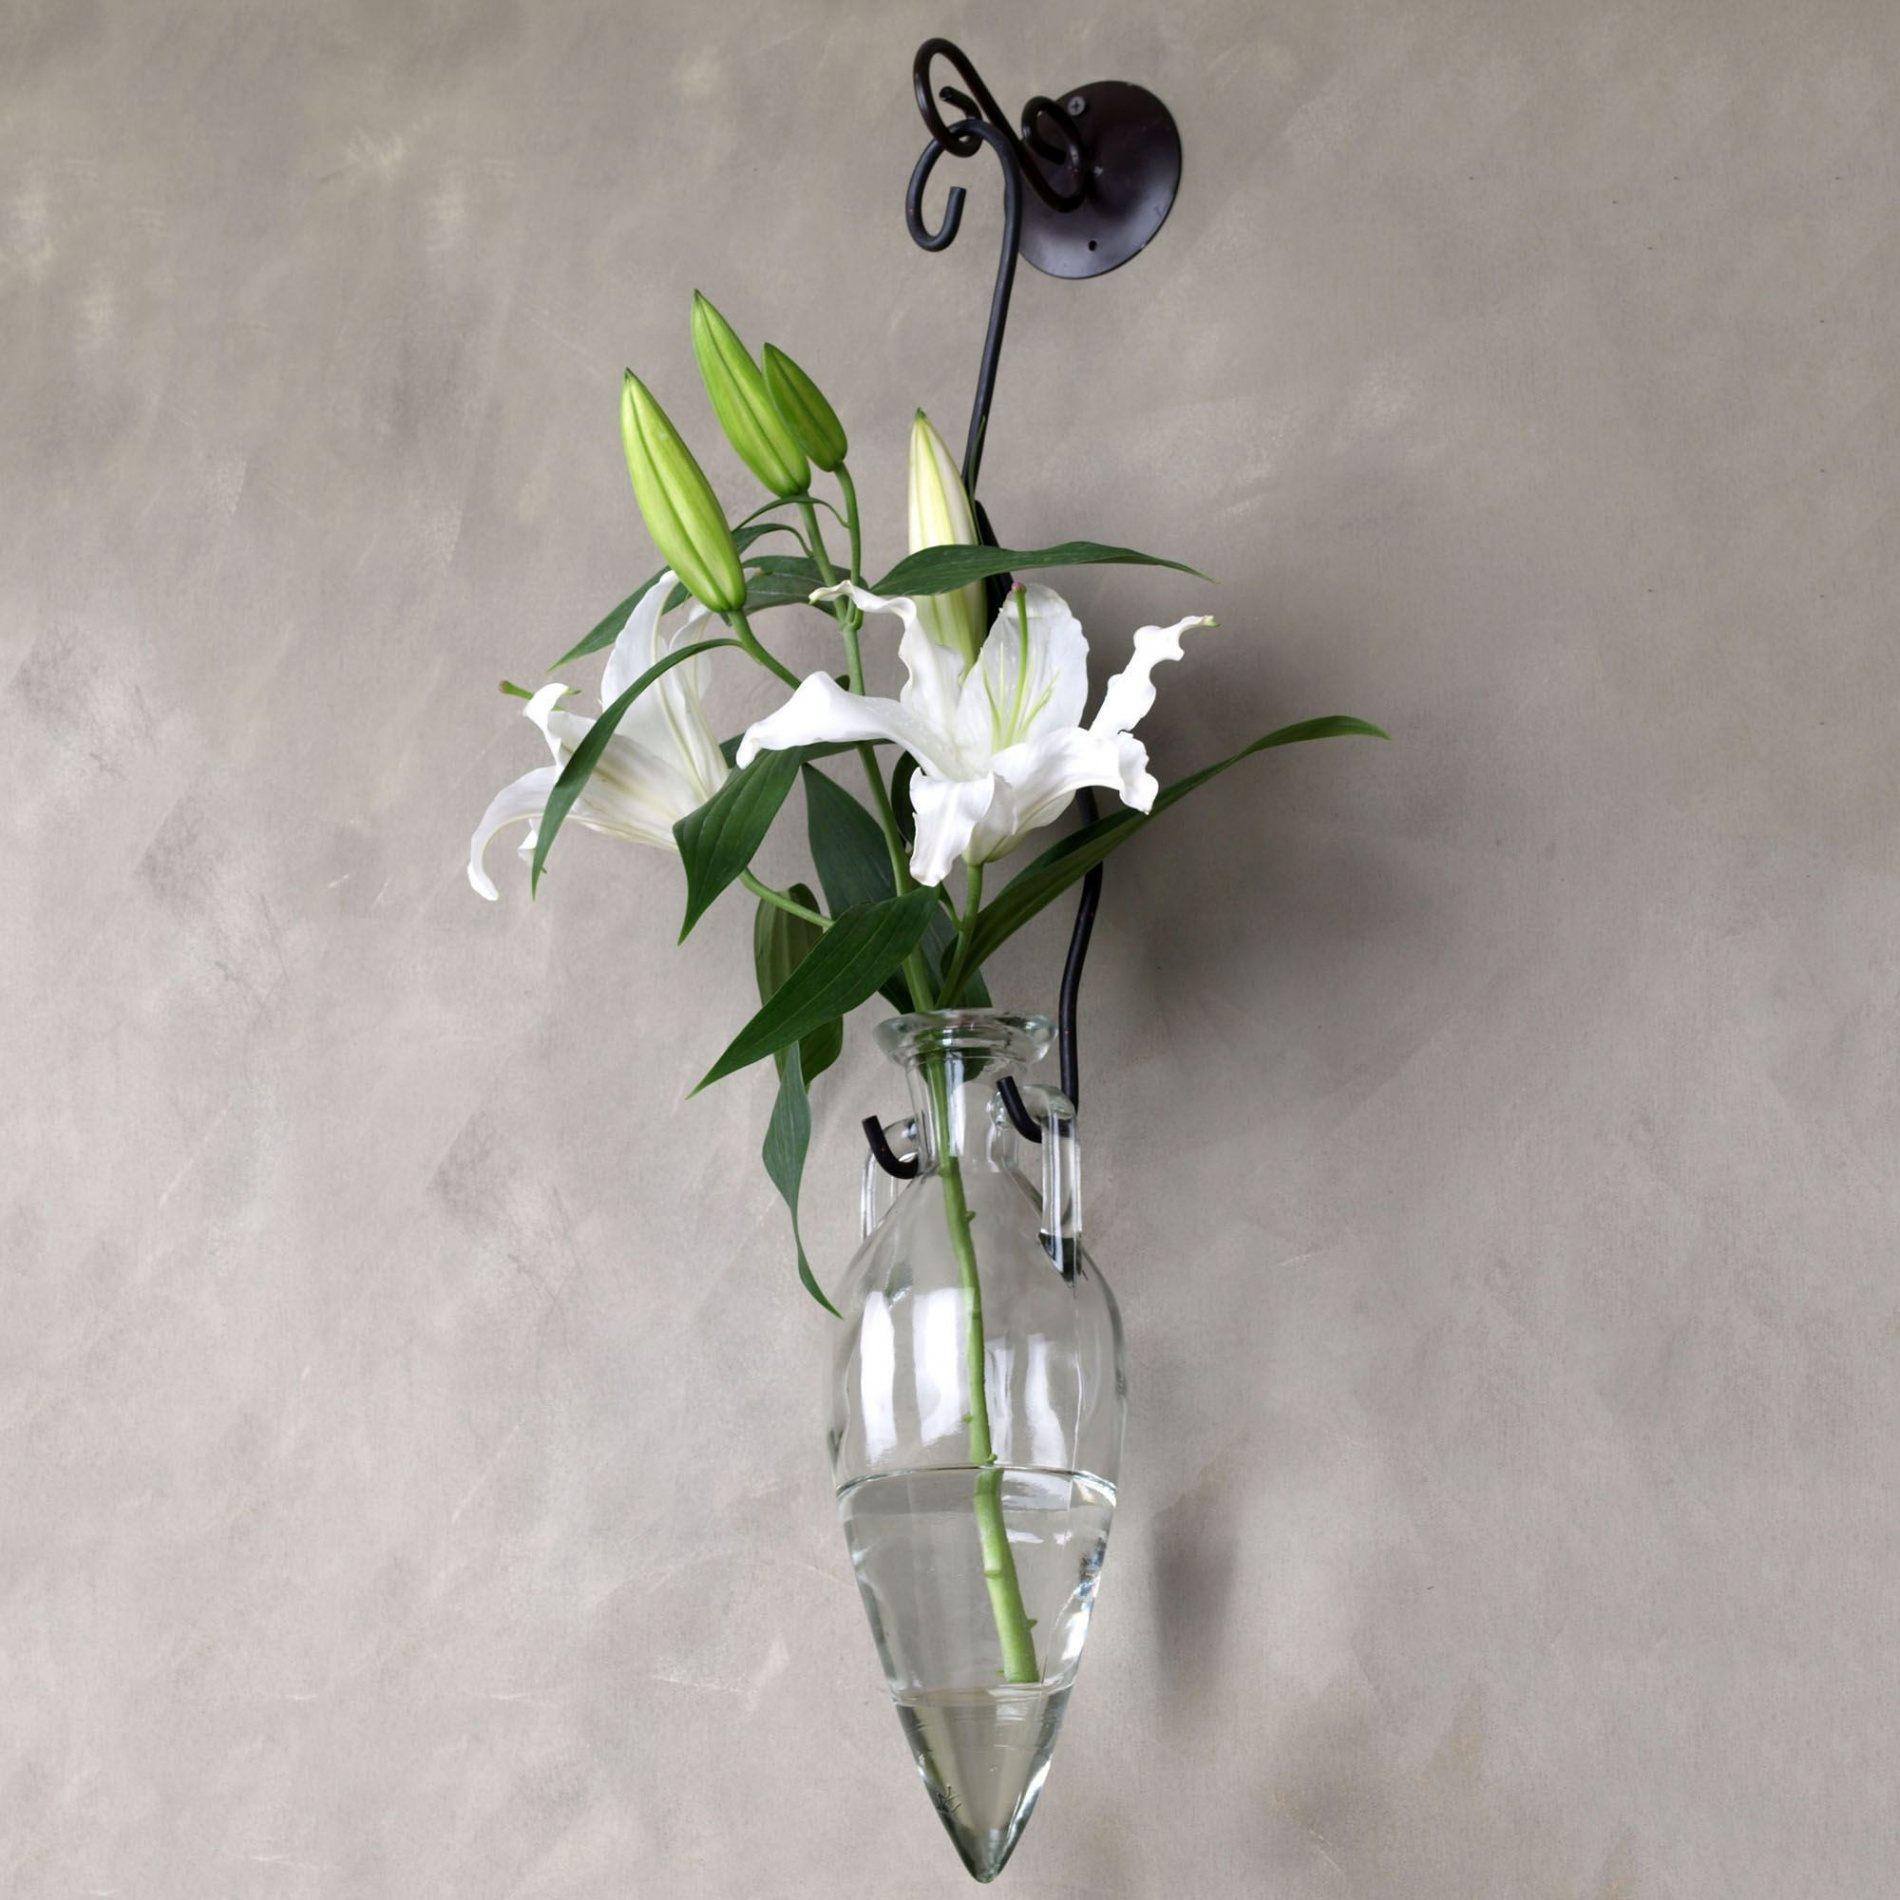 H Vases Wall Hanging Flower Vase Newspaper I 0d Scheme Wall Scheme